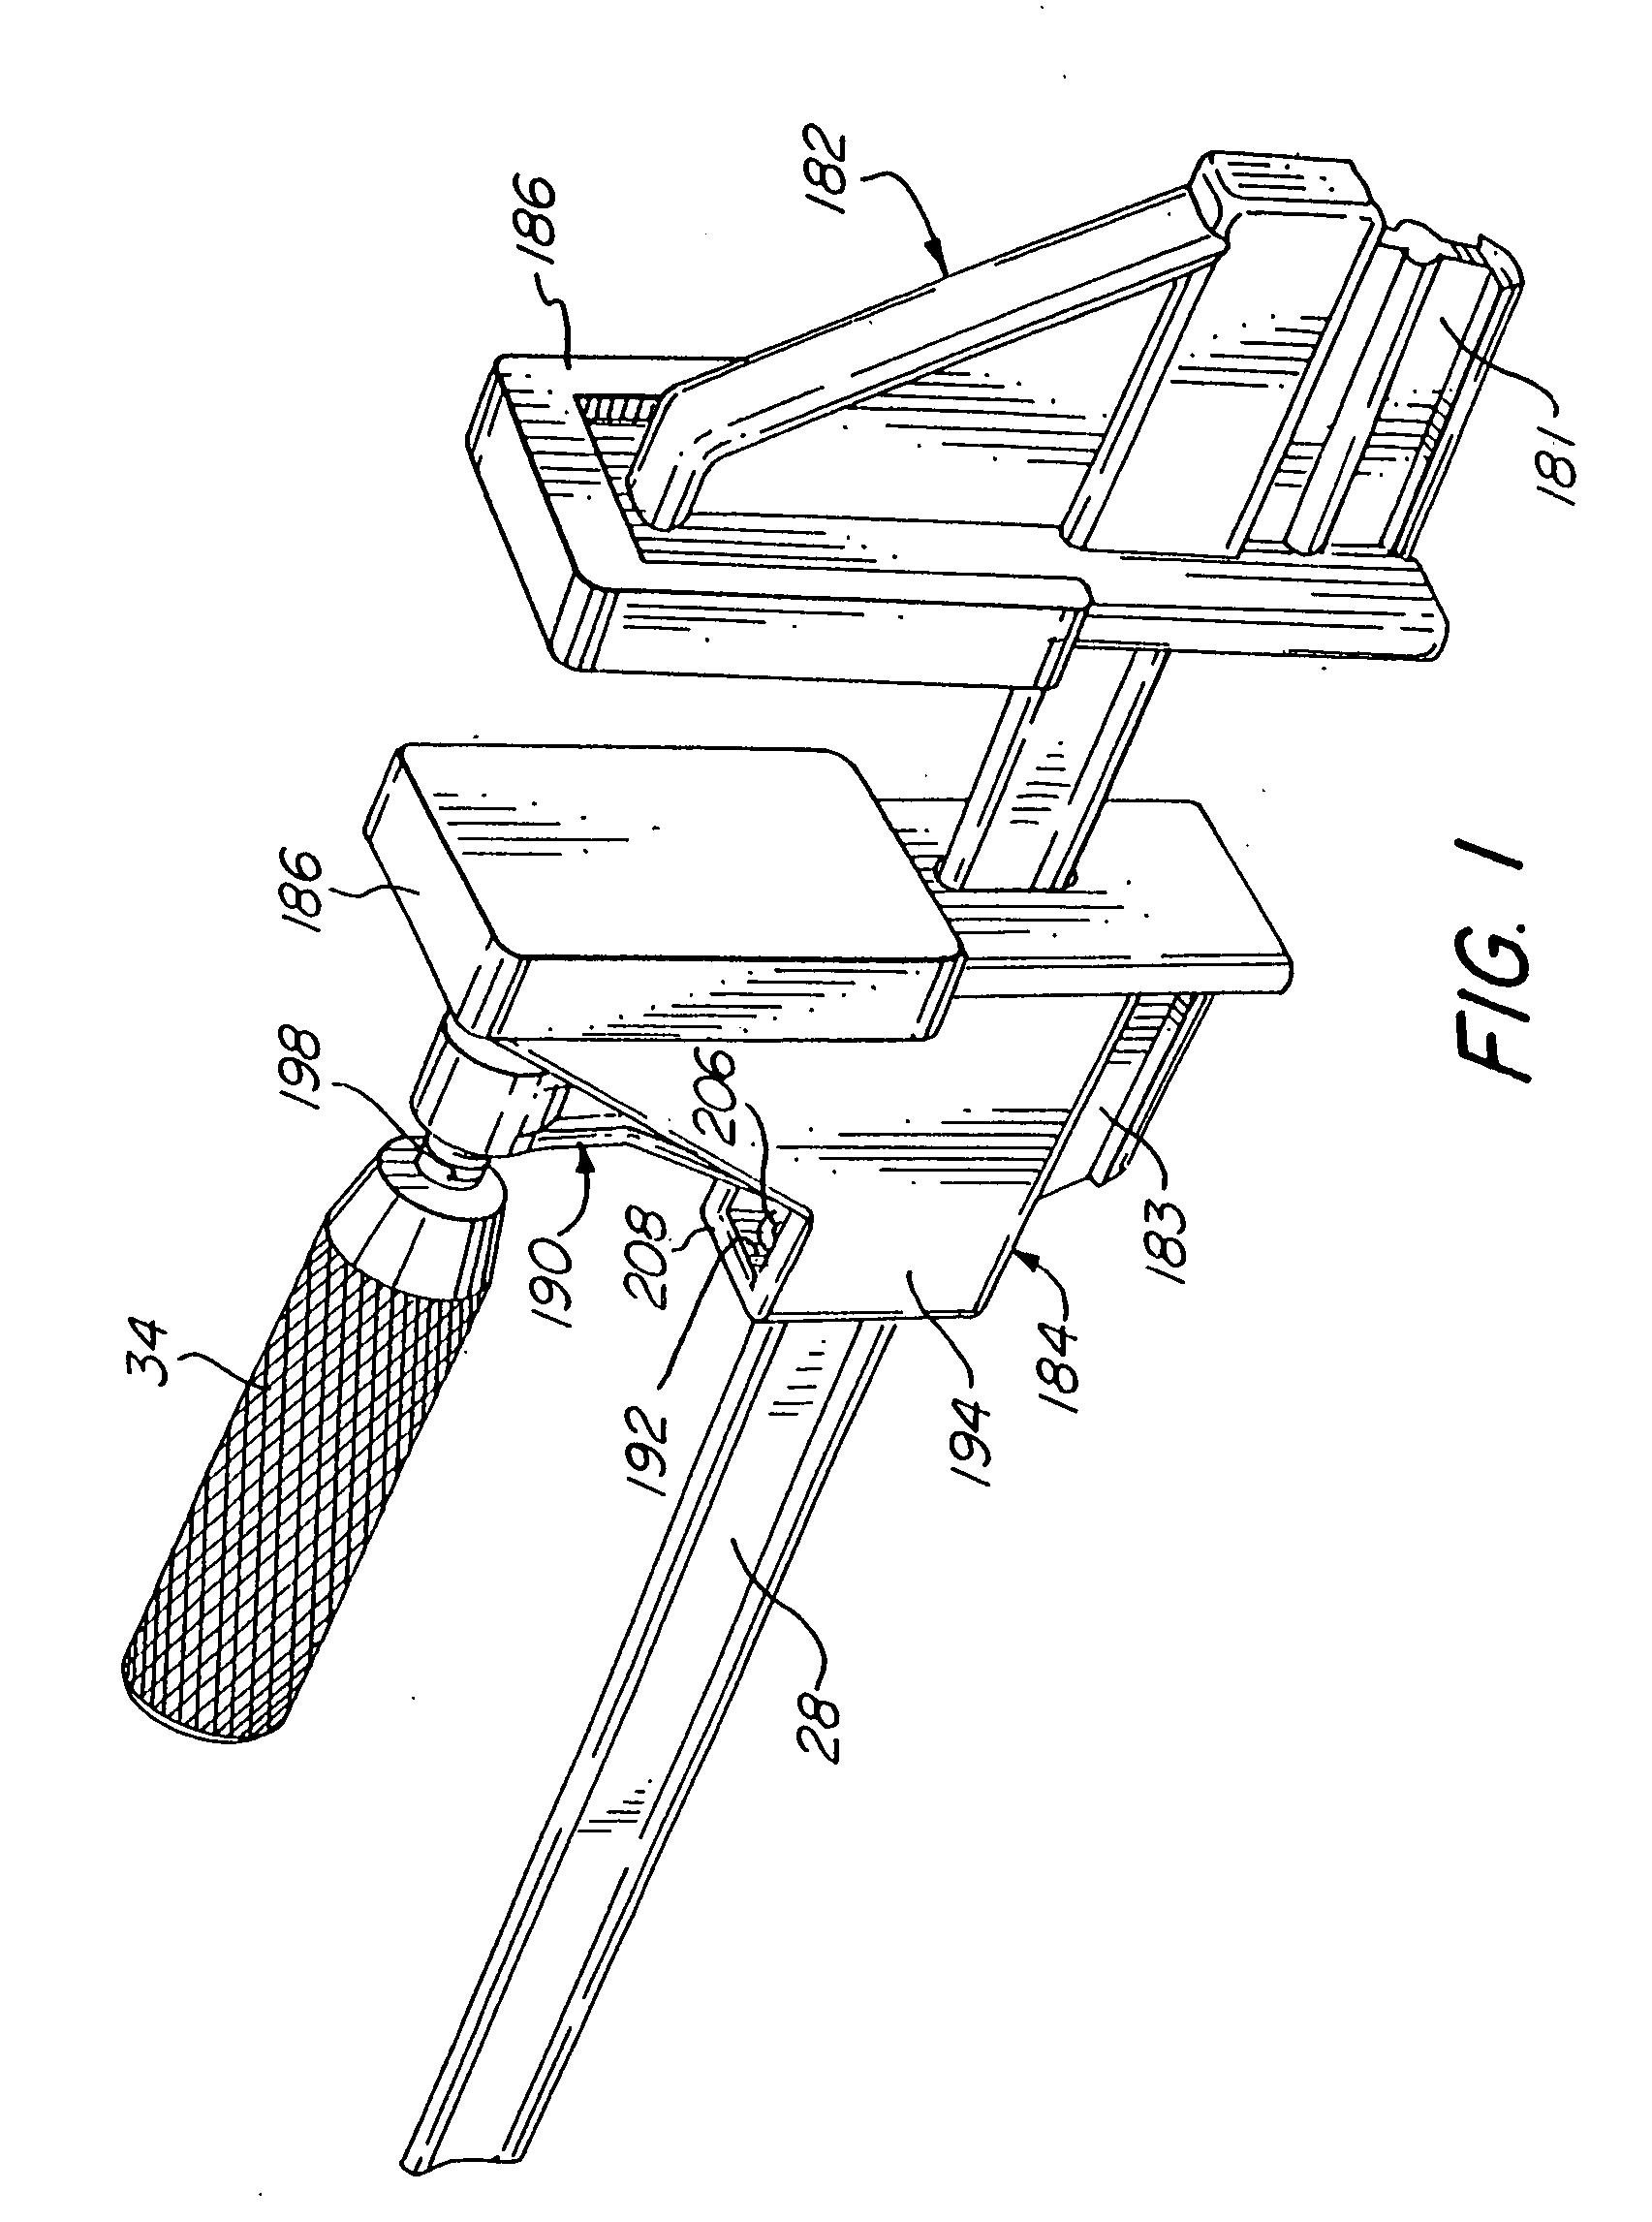 patent us20040245692 - bar clamp